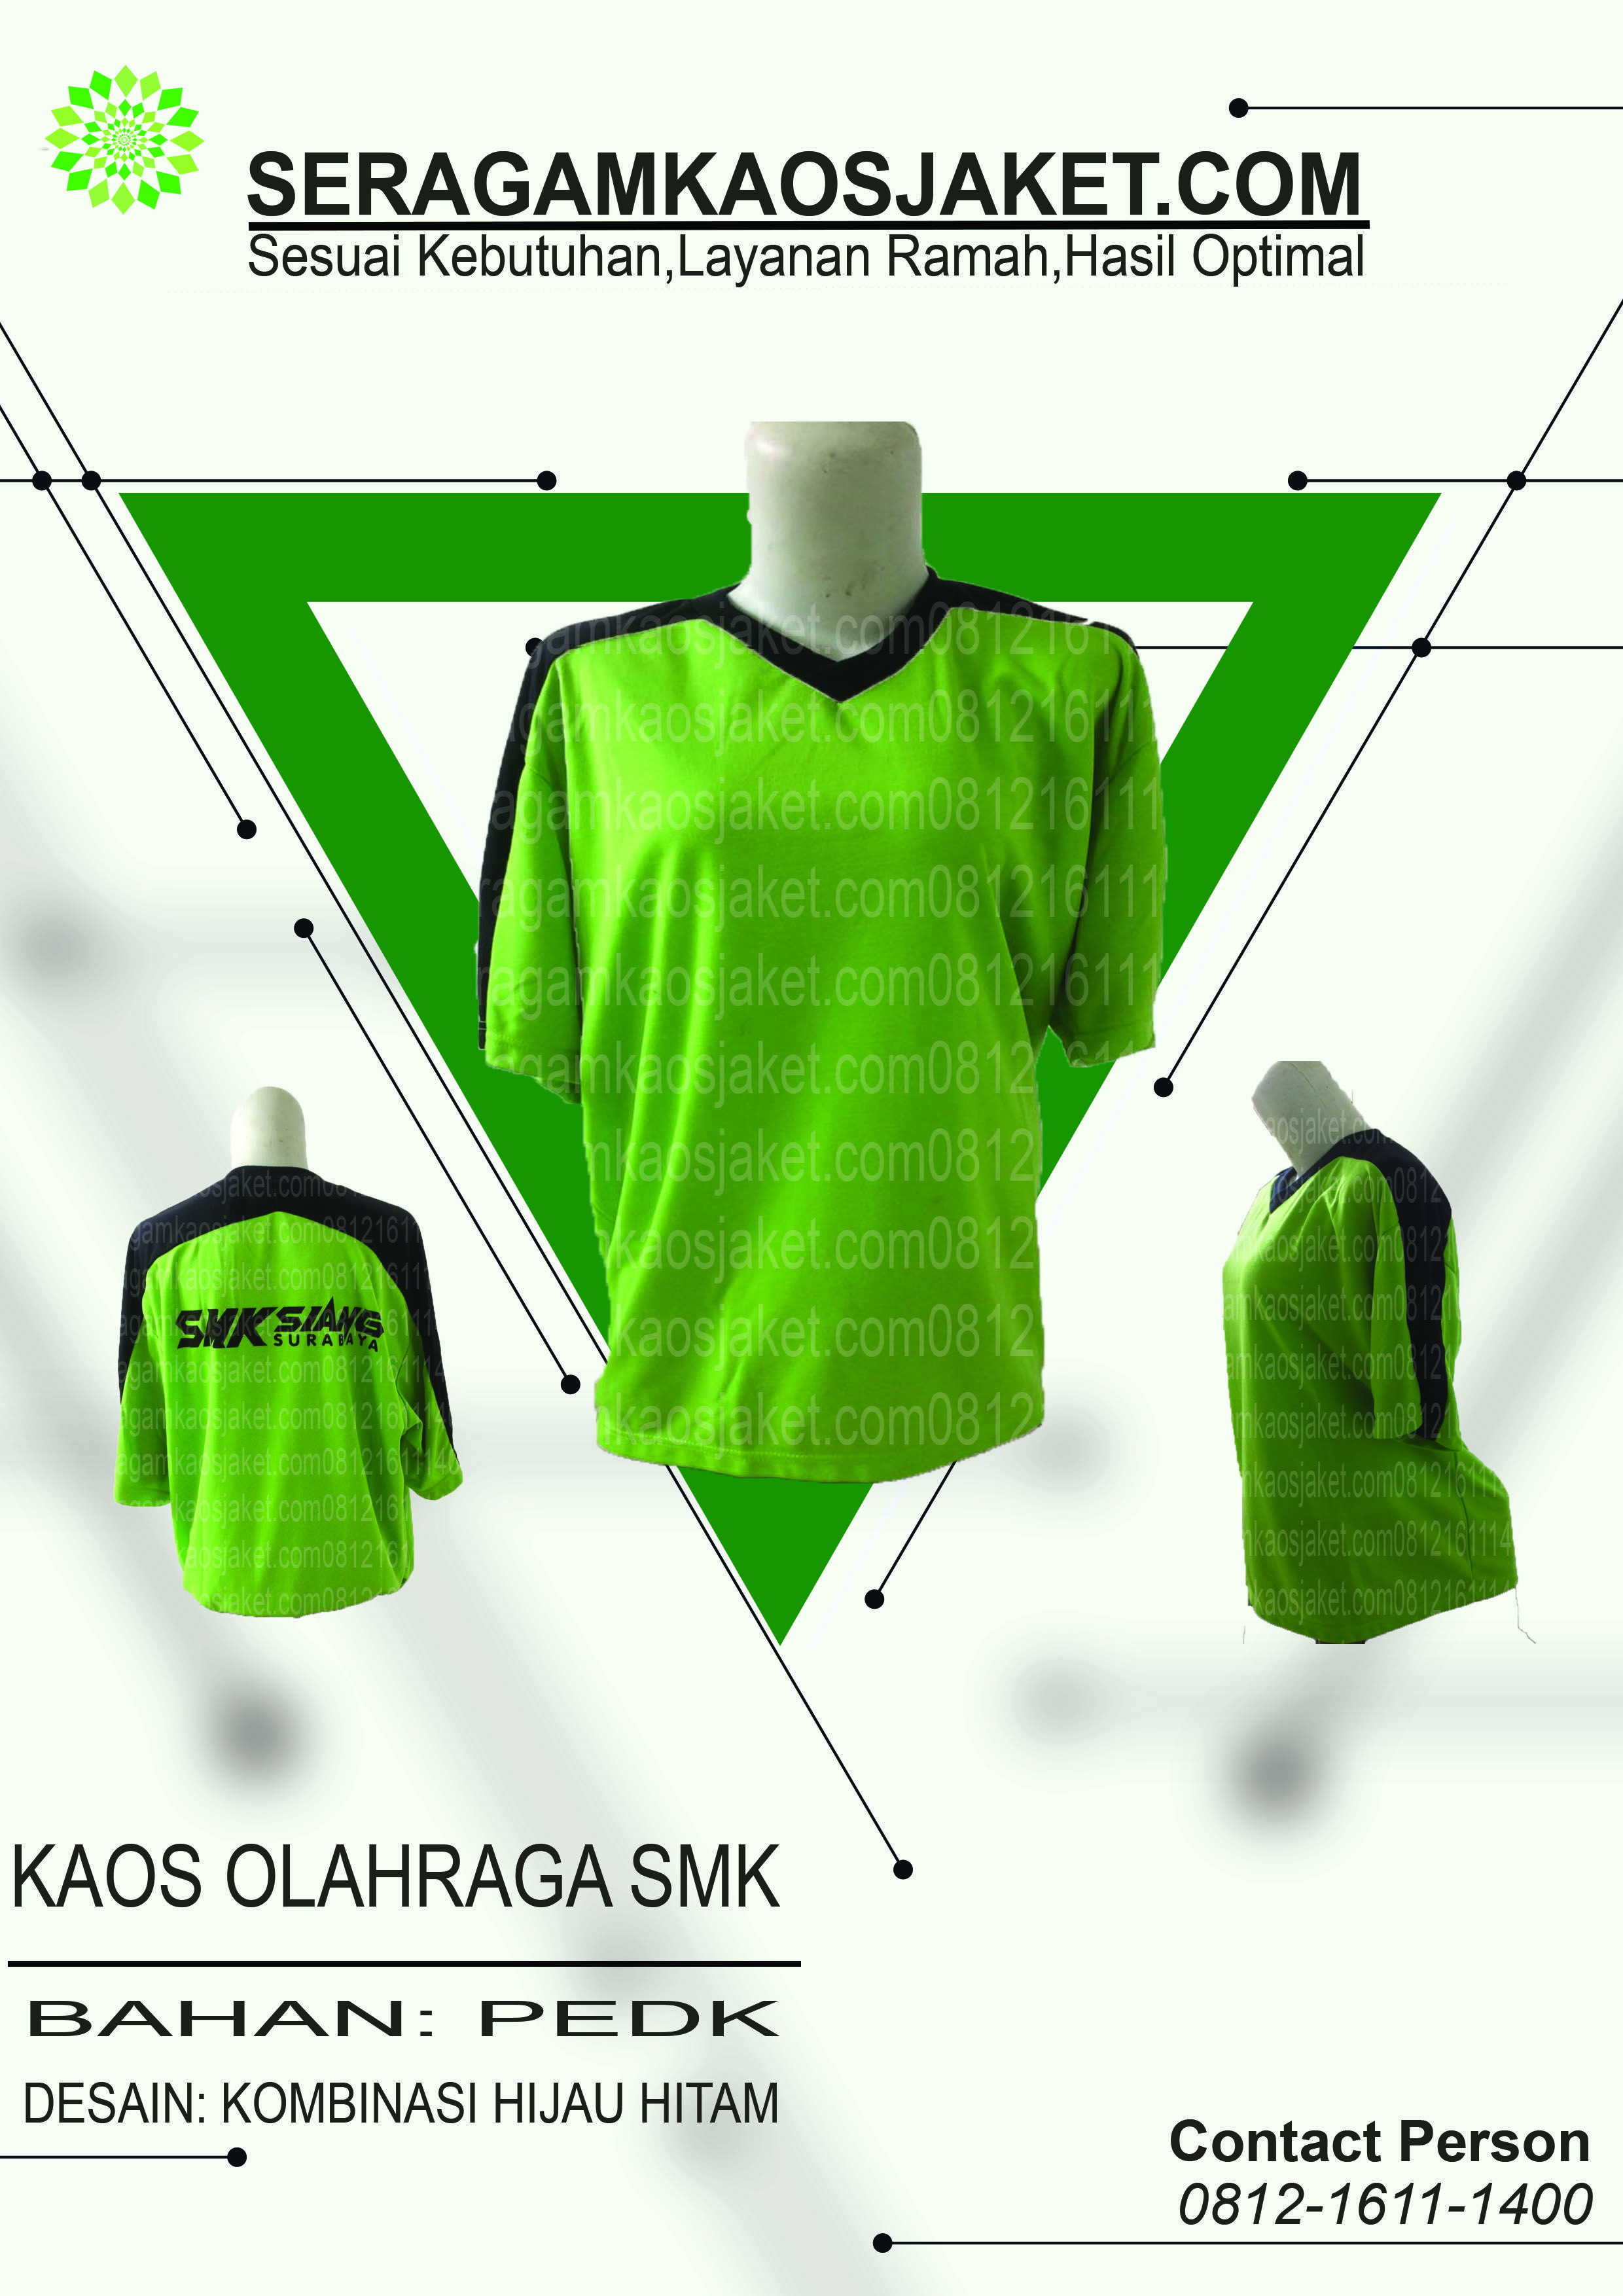 Order Kaos Olahraga Surabaya Kami Buat Berbagai Model Bahan Dan  # Muebles Rekalde